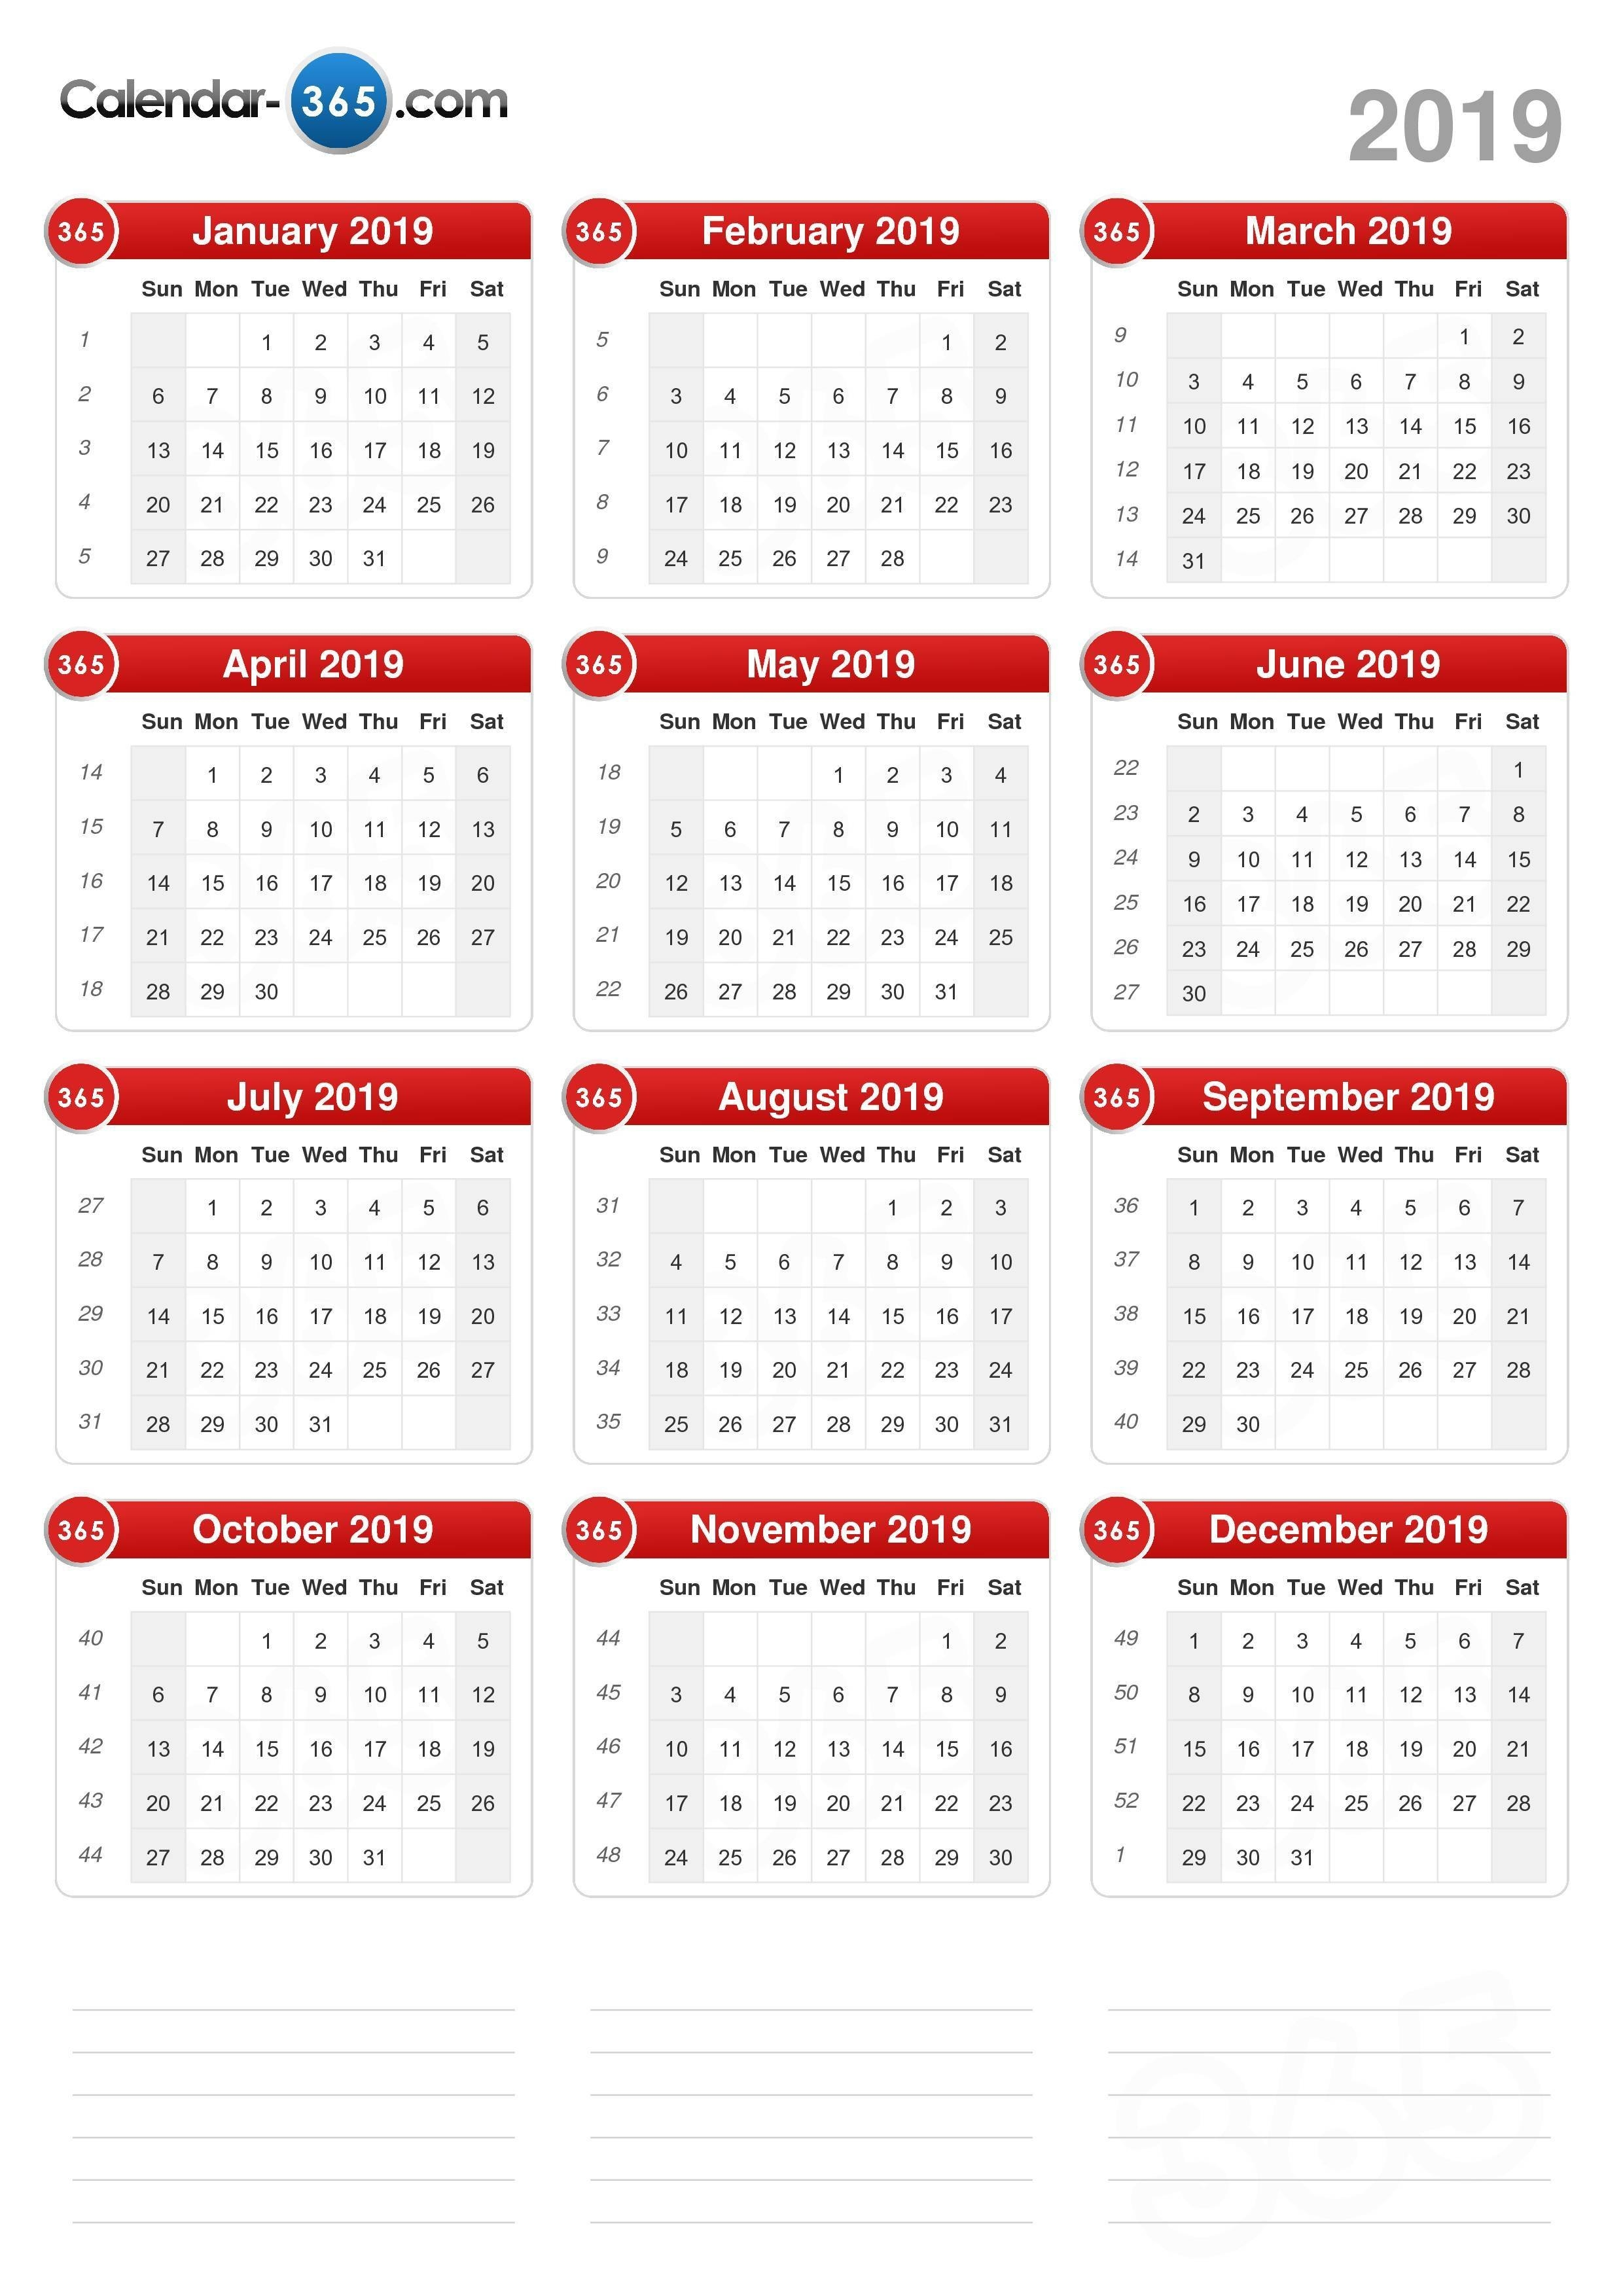 2019 Calendar 4 Week Period Calendar 2019